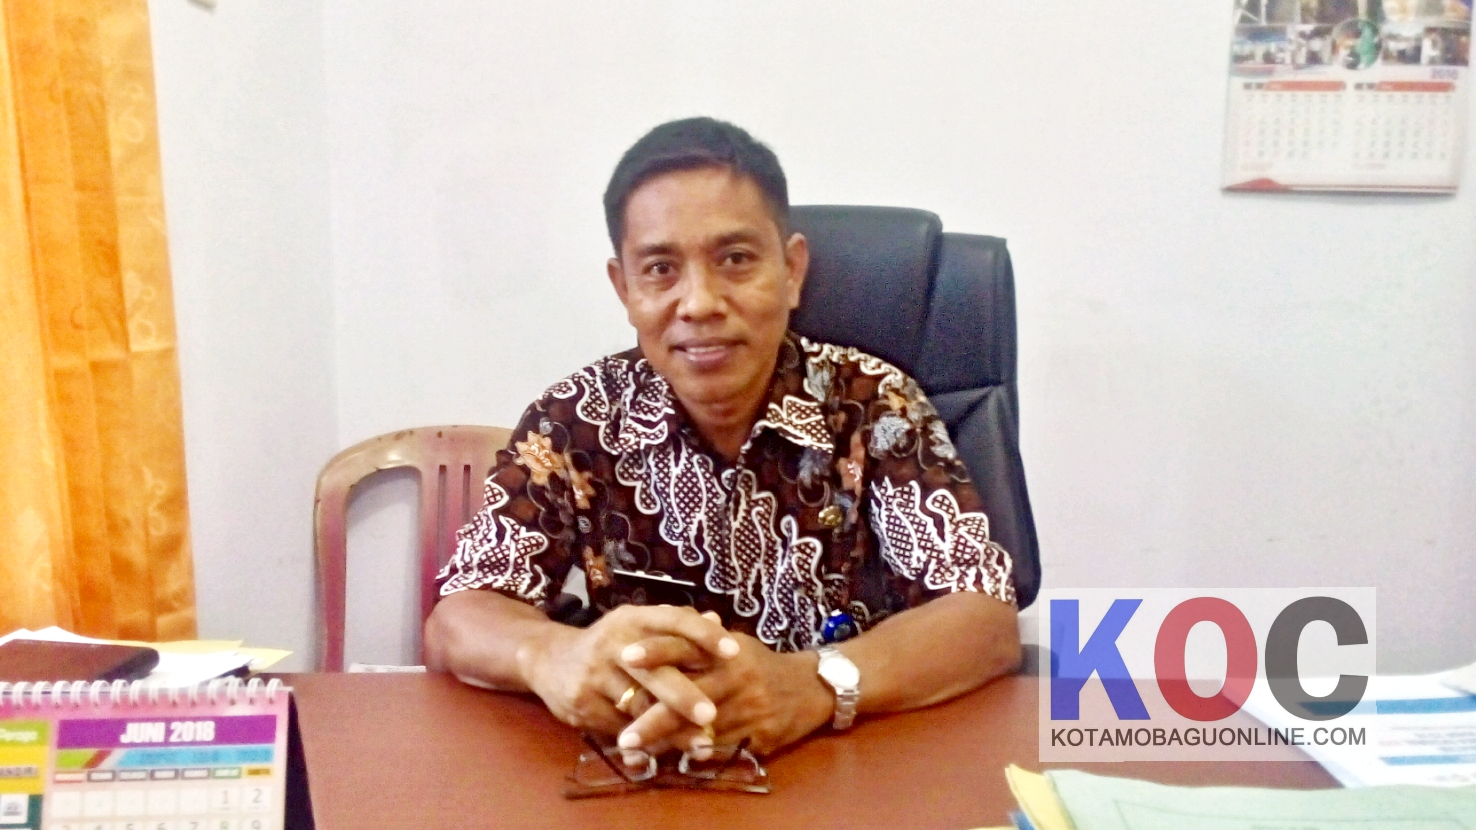 Kepala Dinas PPKB Bolmong I Ketut Kolak. (Foto: Jr)